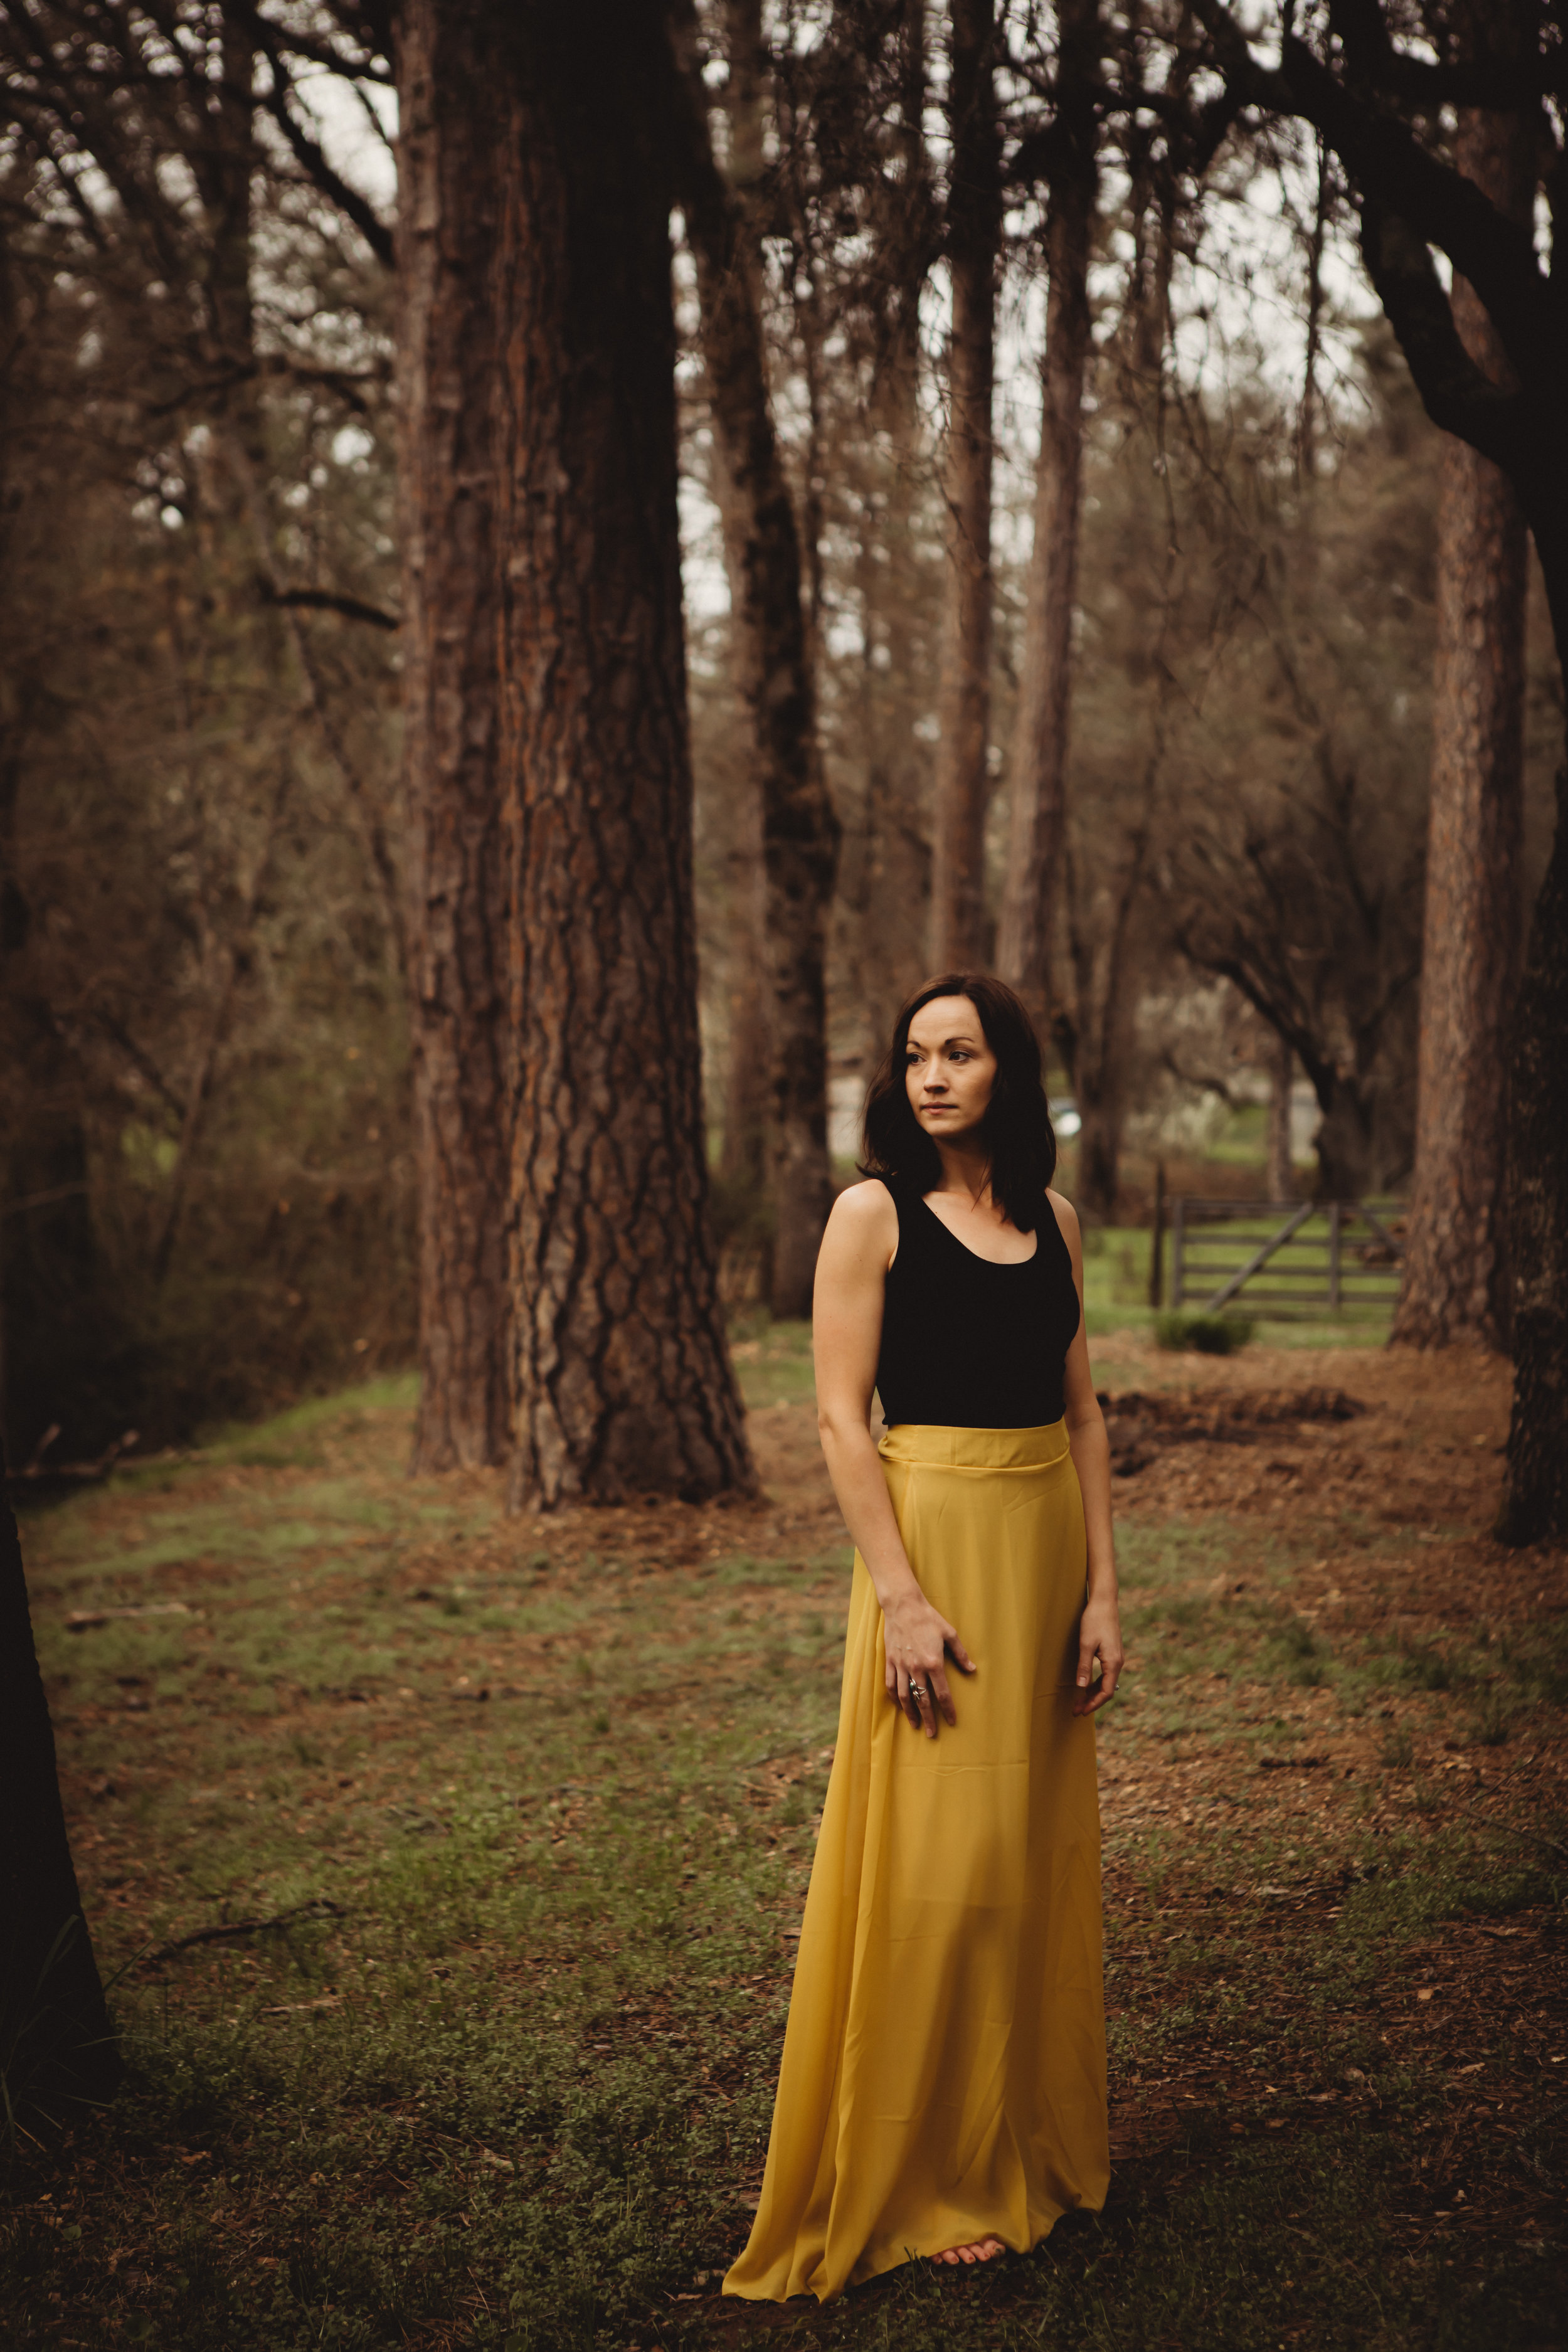 Juniper Skirt in Yellow    Size 8 fits like a Medium